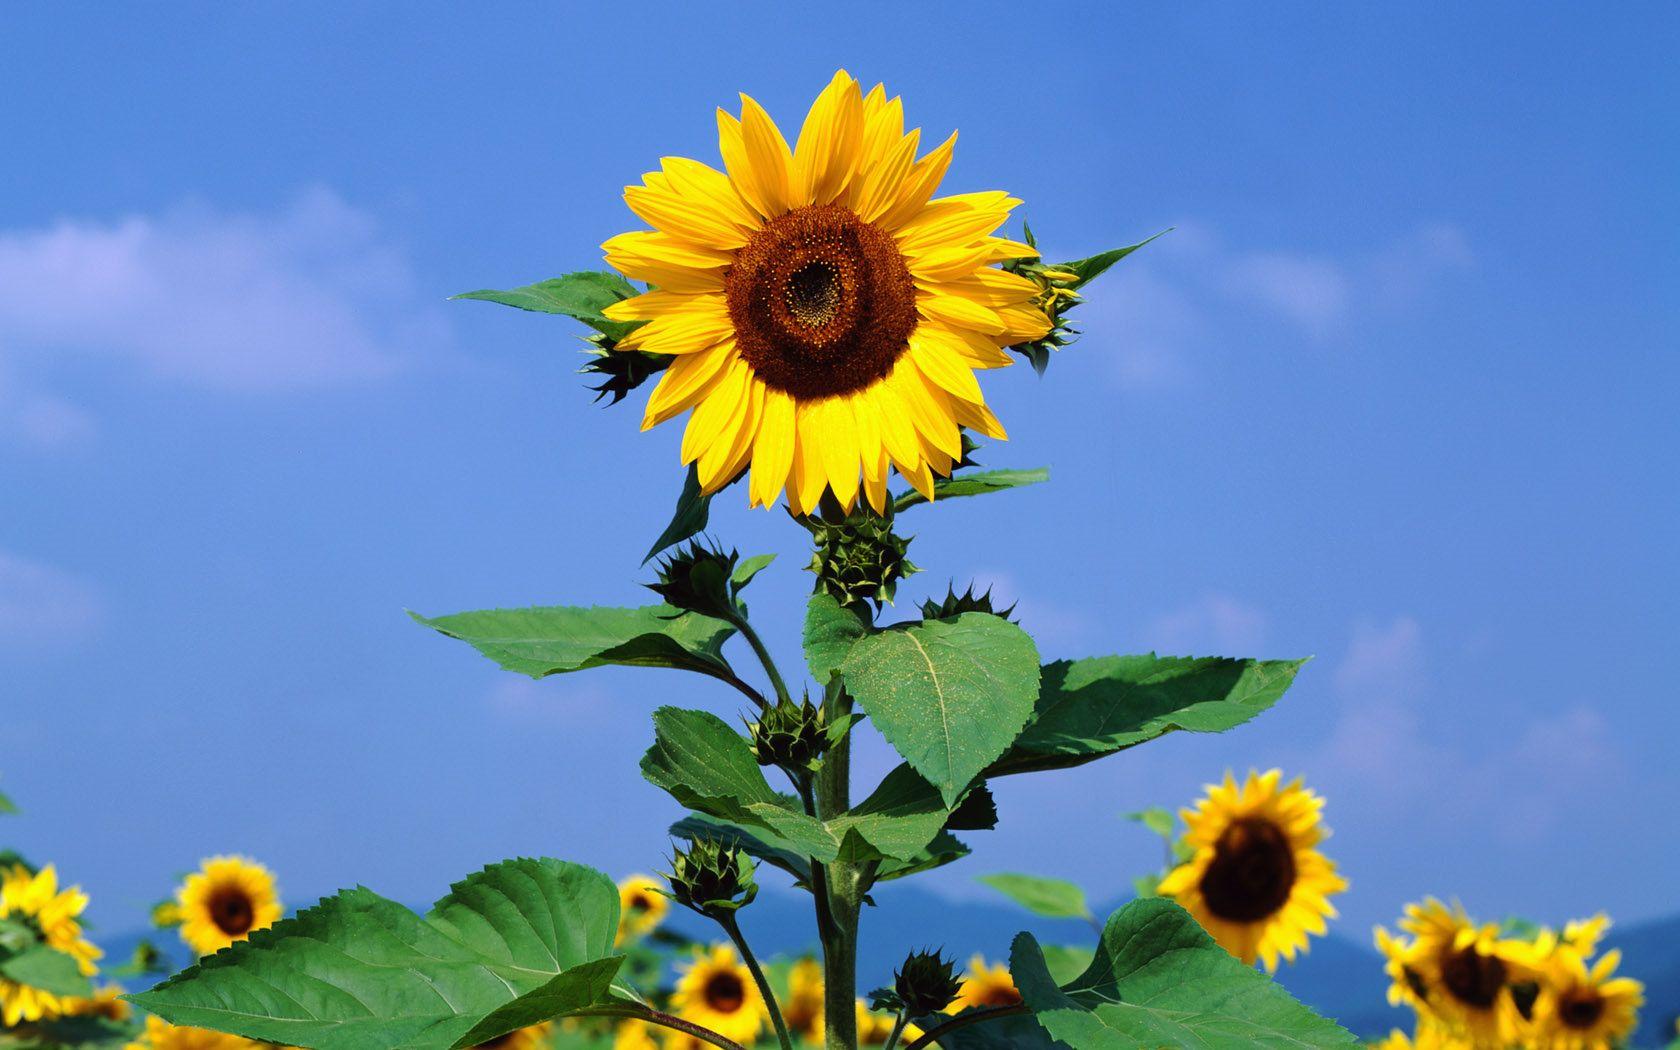 sunflower wallpaper 3831 Sunflowers background